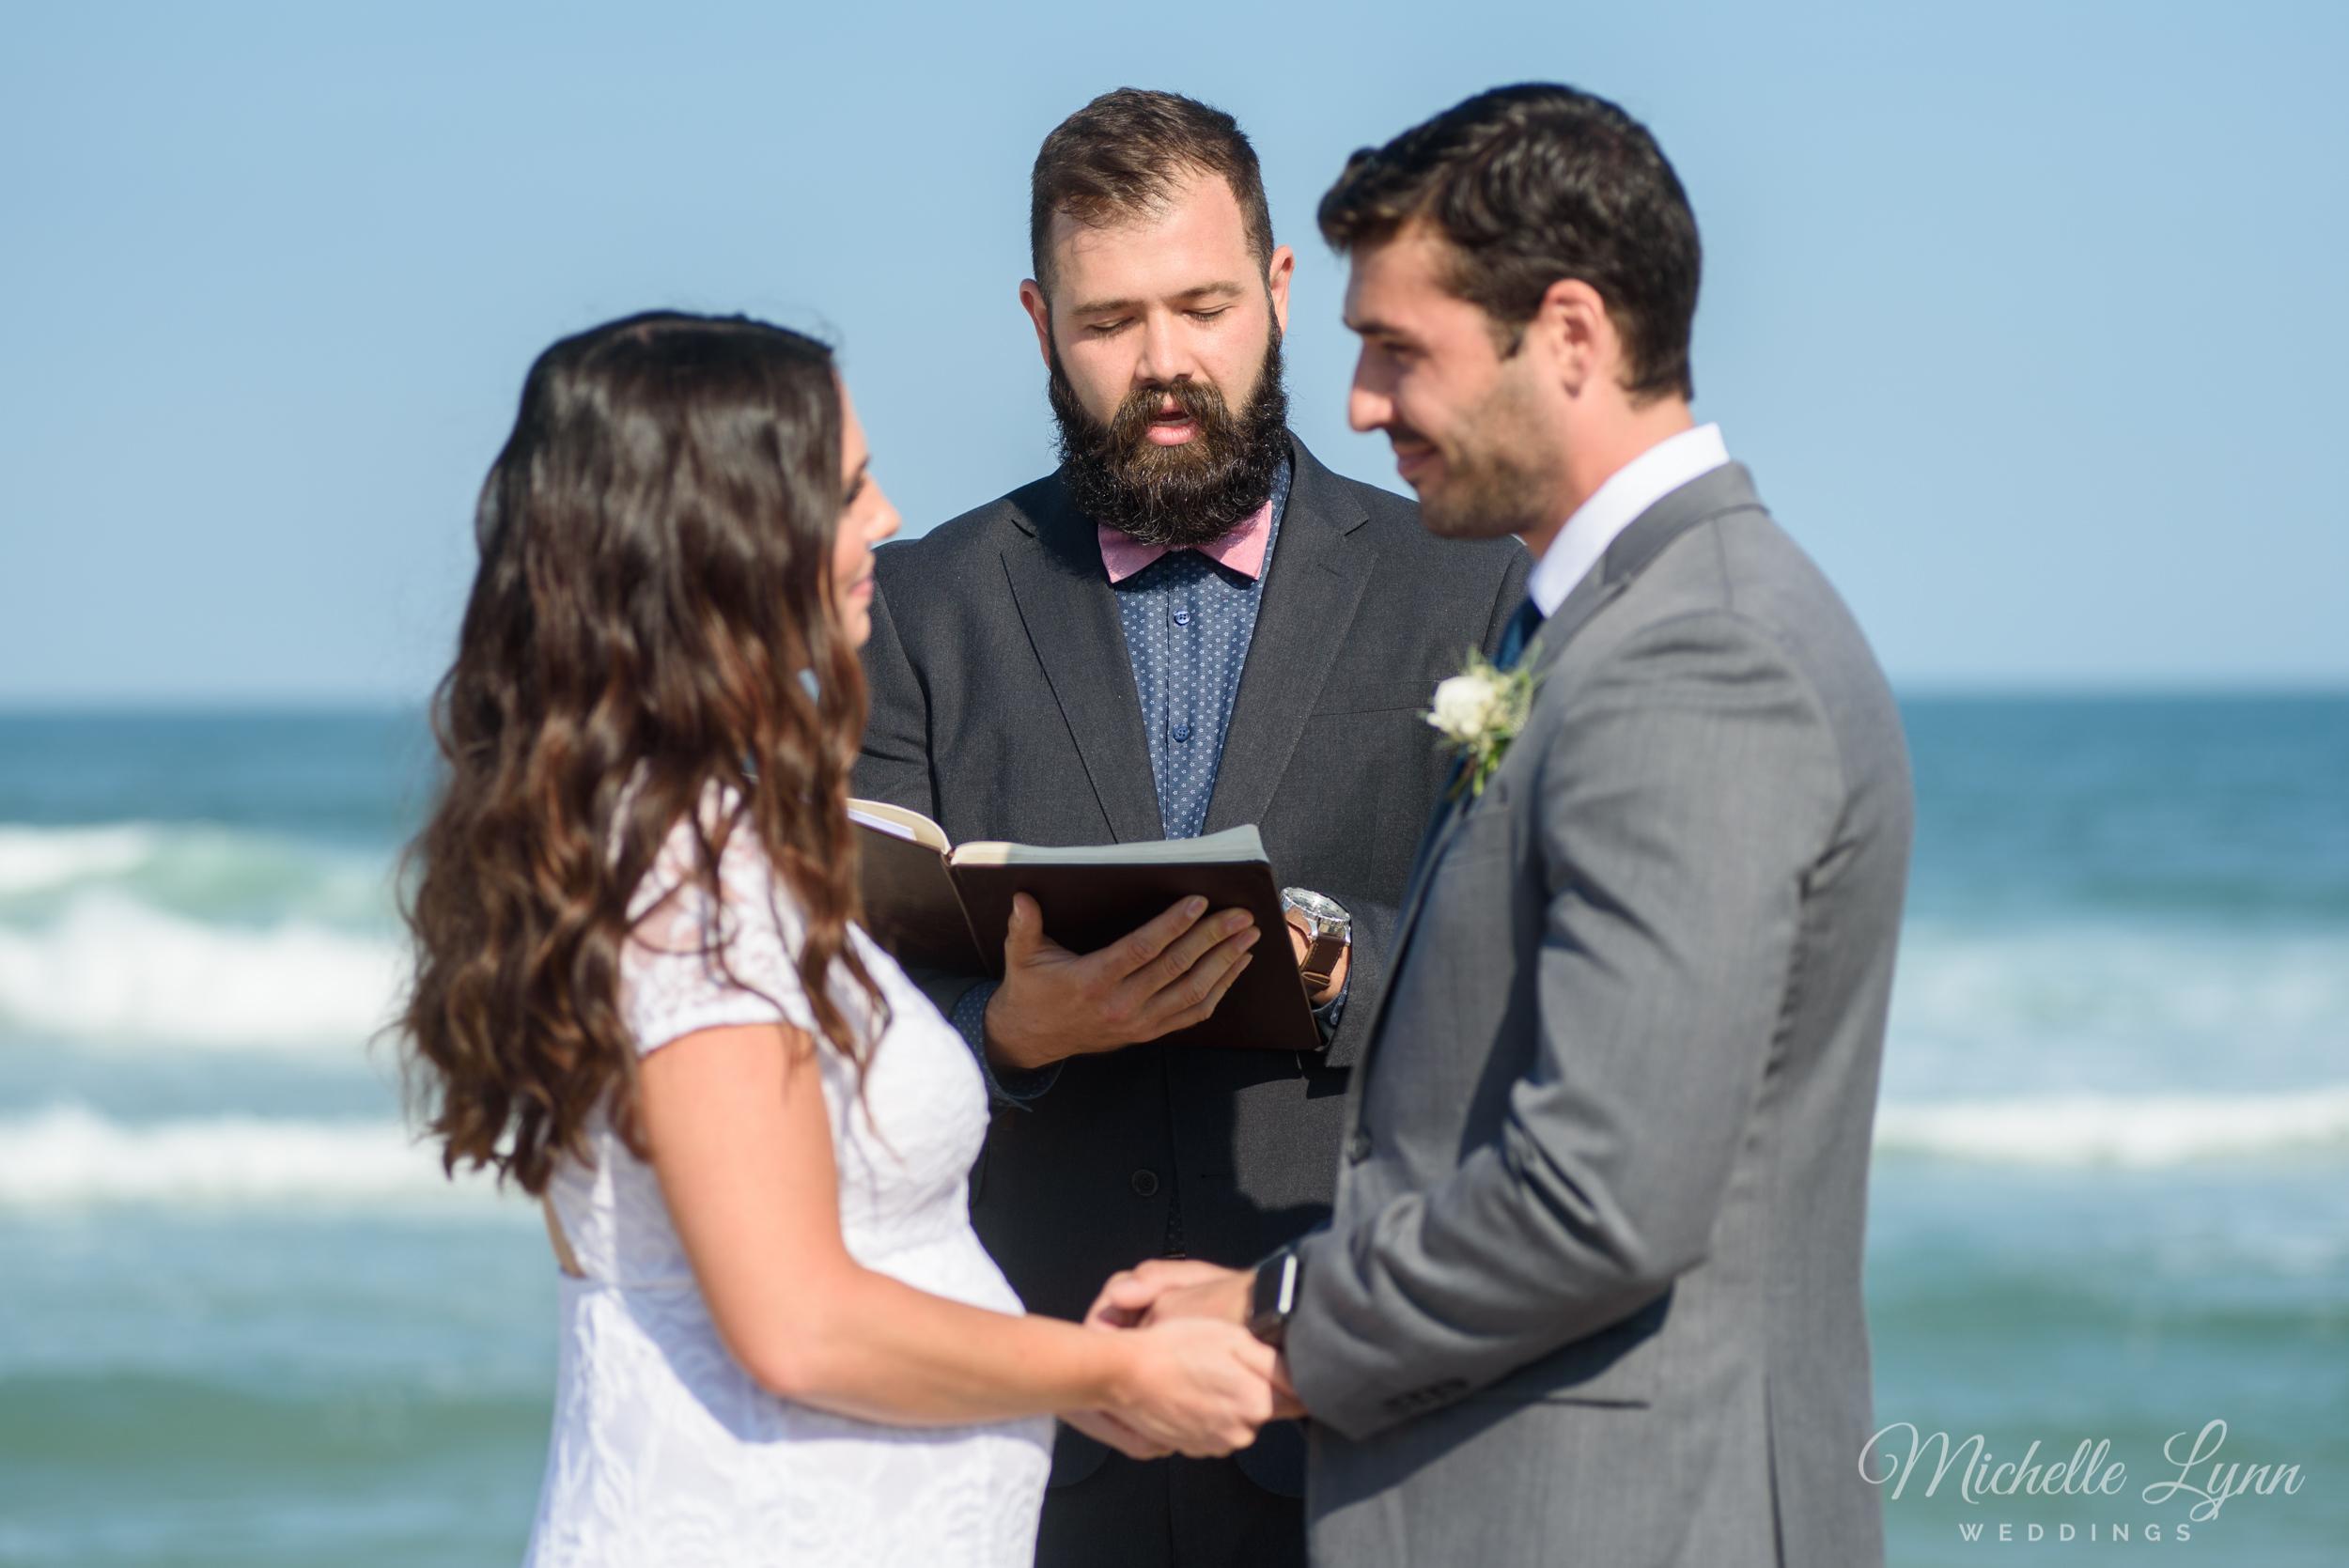 mlw-brant-beach-lbi-wedding-photography-16.jpg